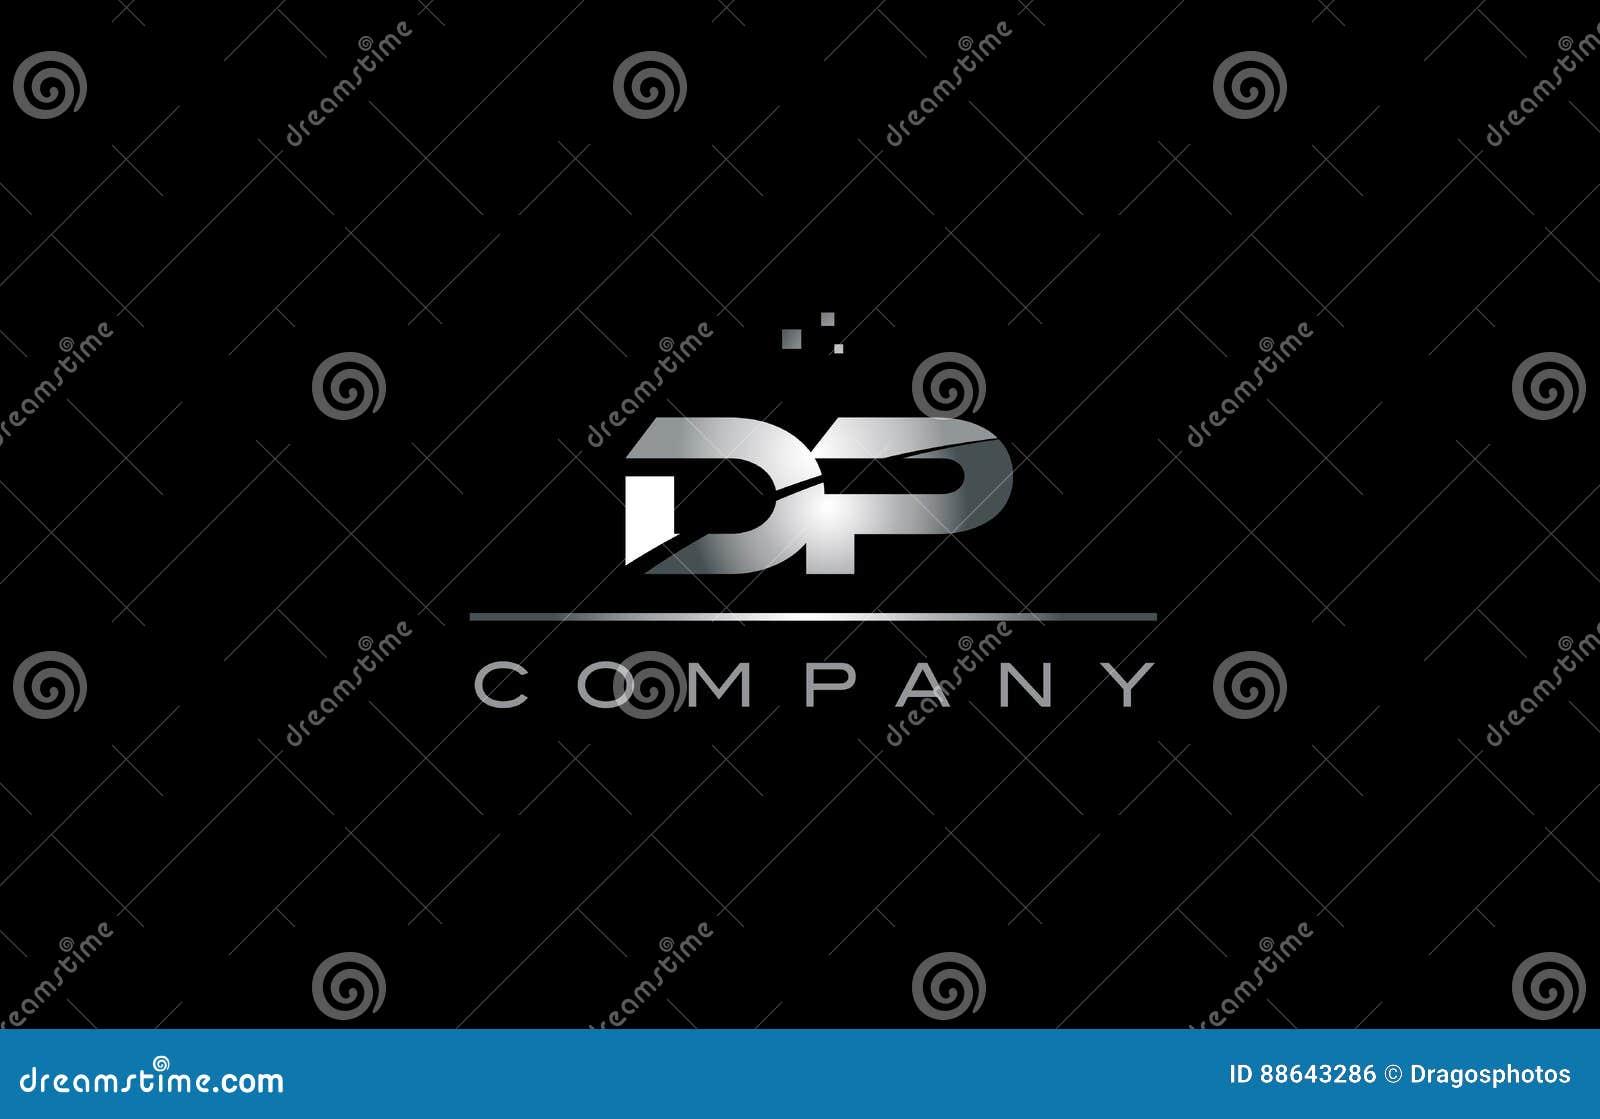 dp d p silver grey metal metallic alphabet letter logo icon stock